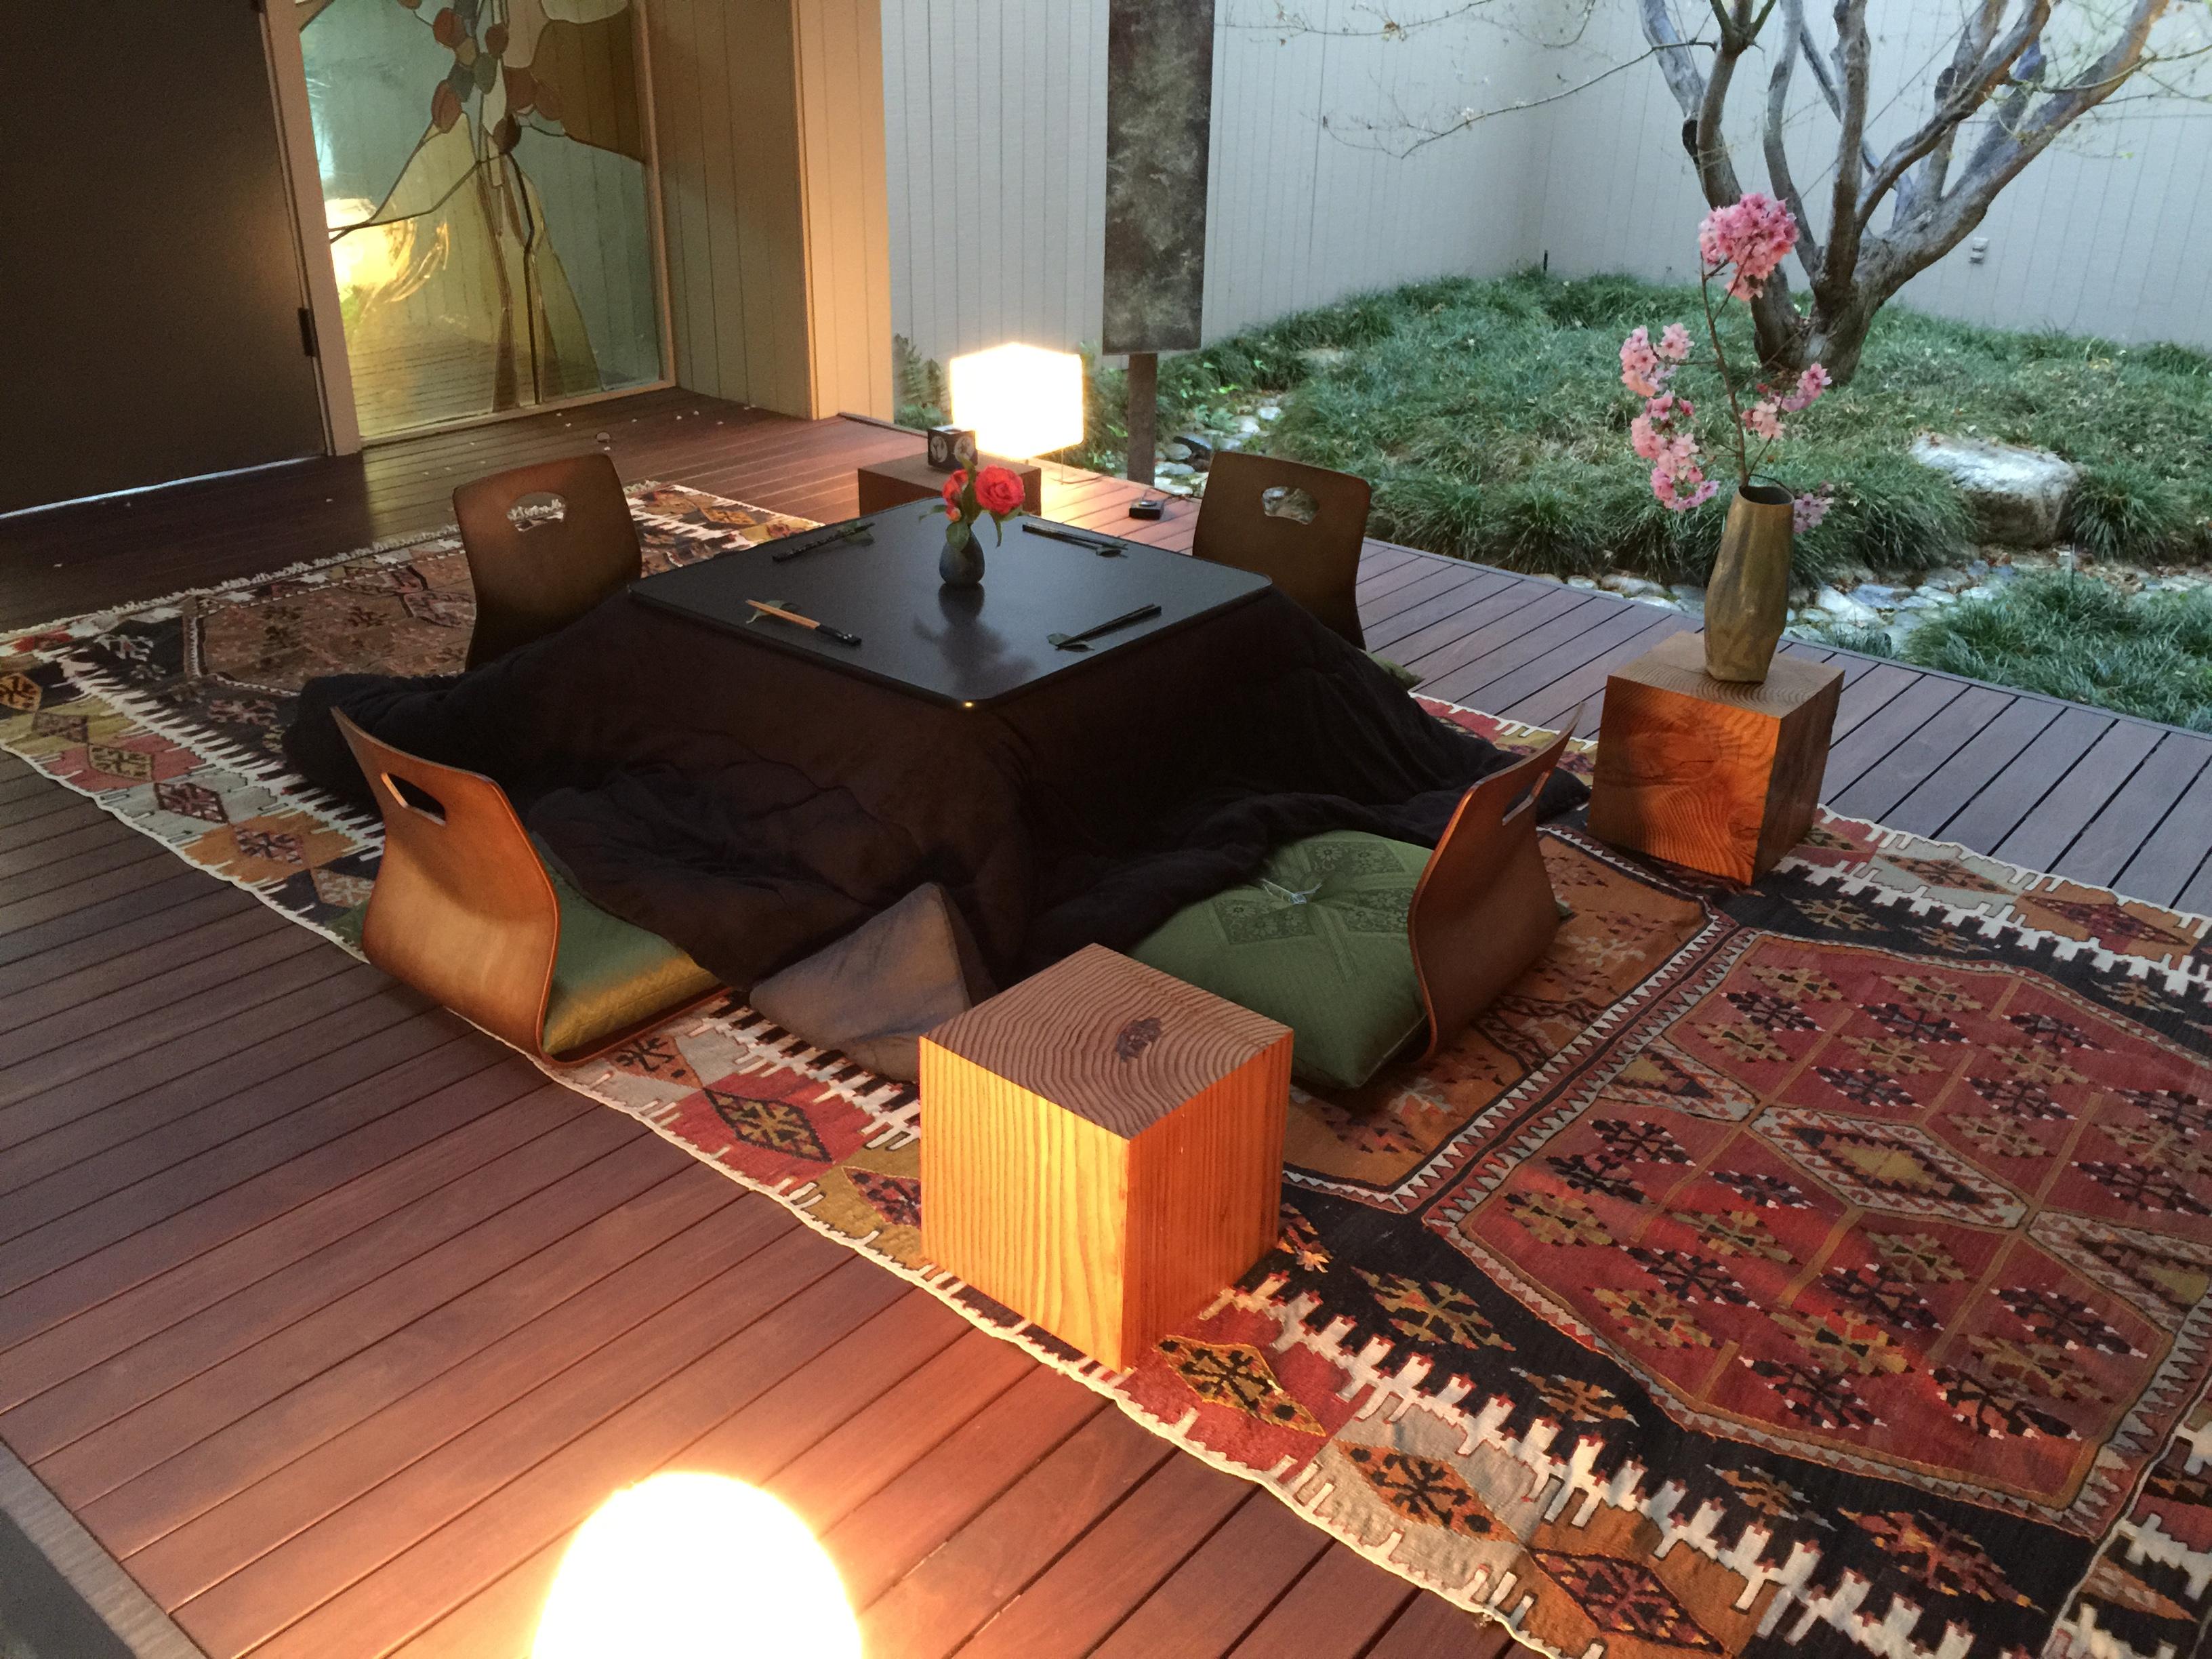 The kotatsu on the bridge